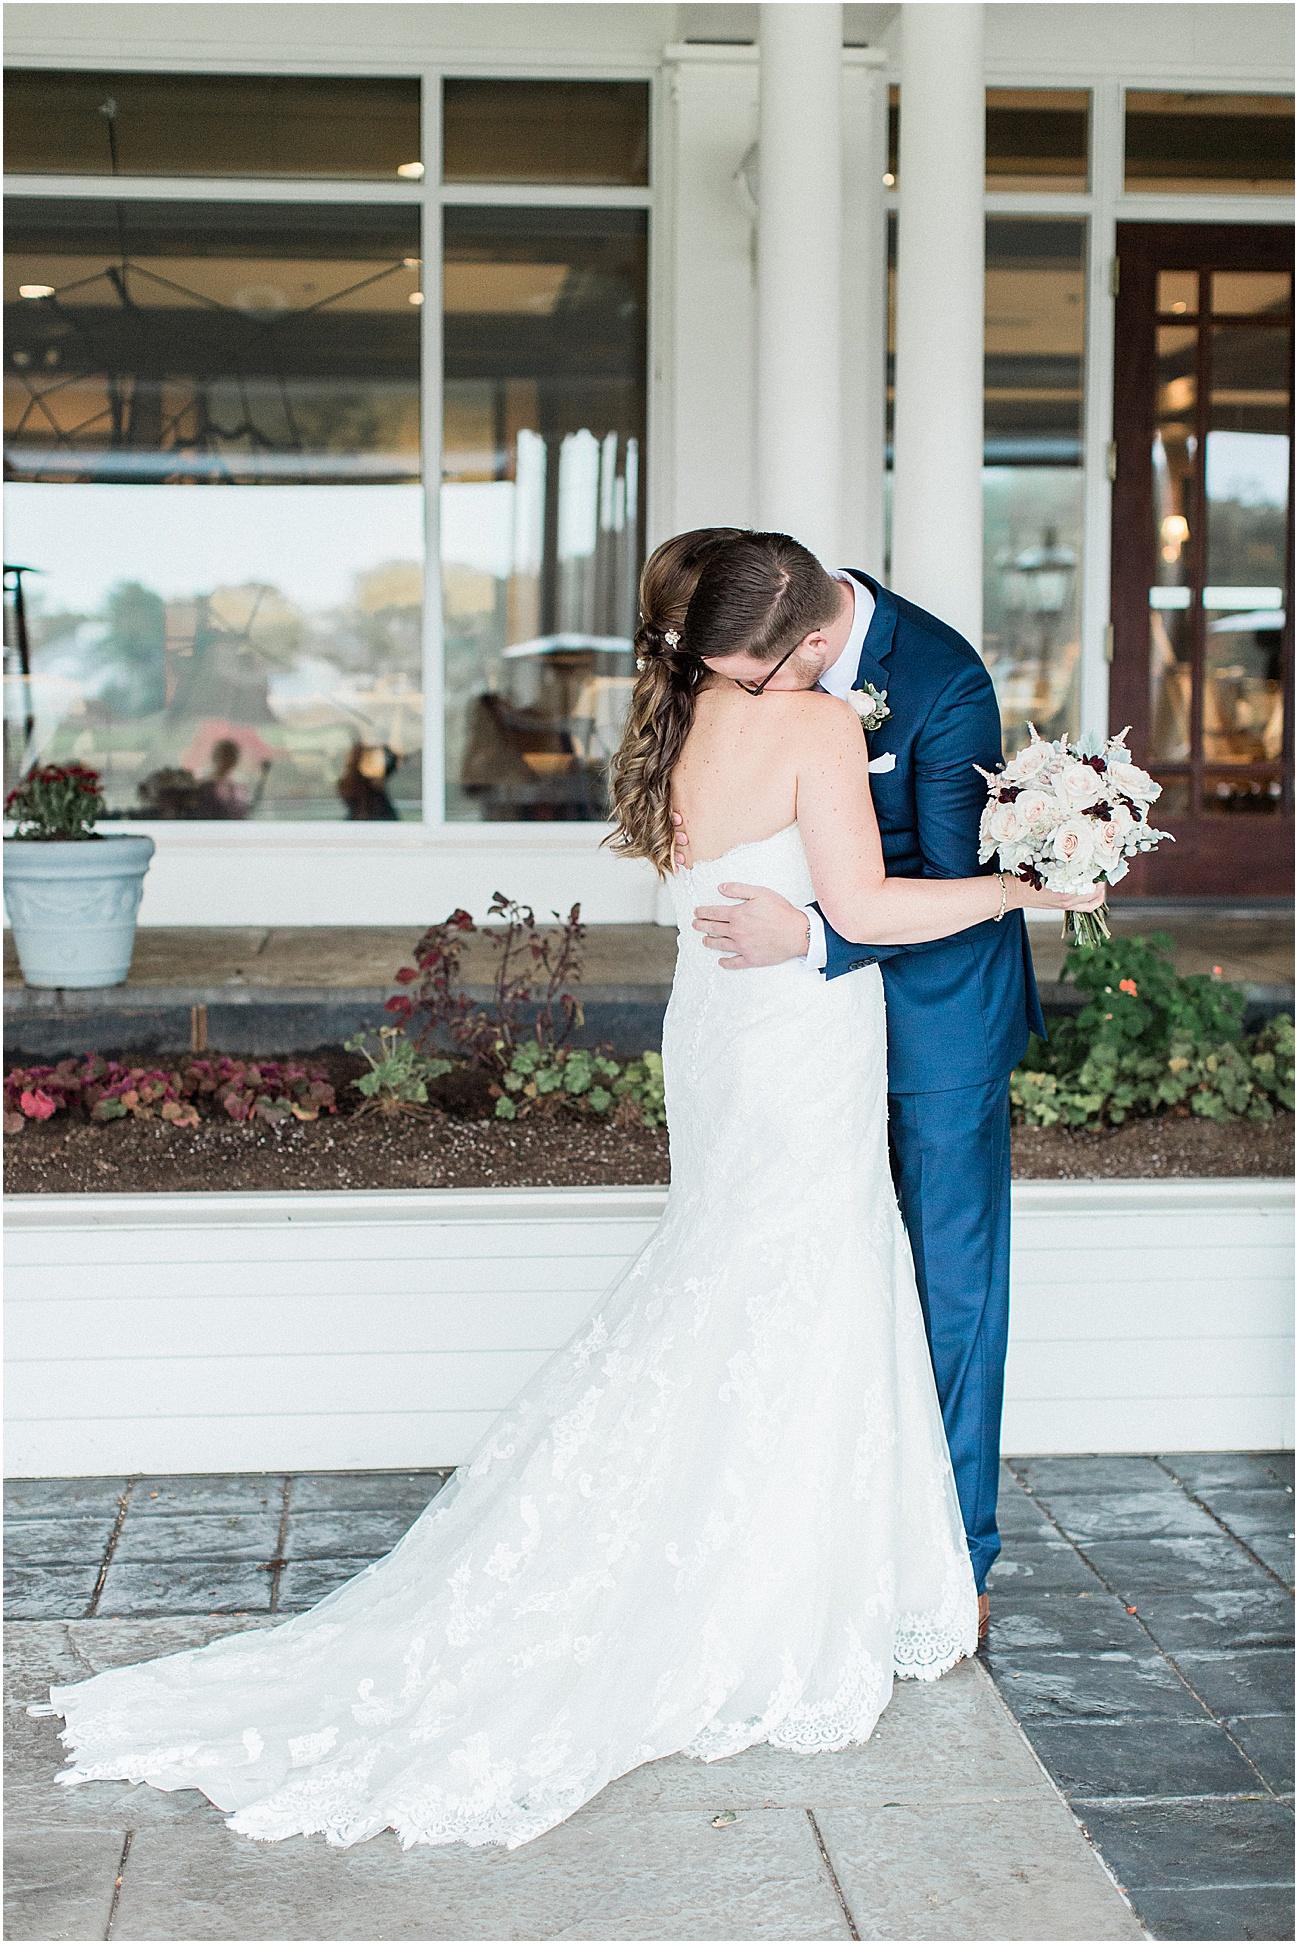 danielle_sean_willowbend_rain_rainy_day_cape_cod_boston_wedding_photographer_meredith_jane_photography_photo_1668.jpg